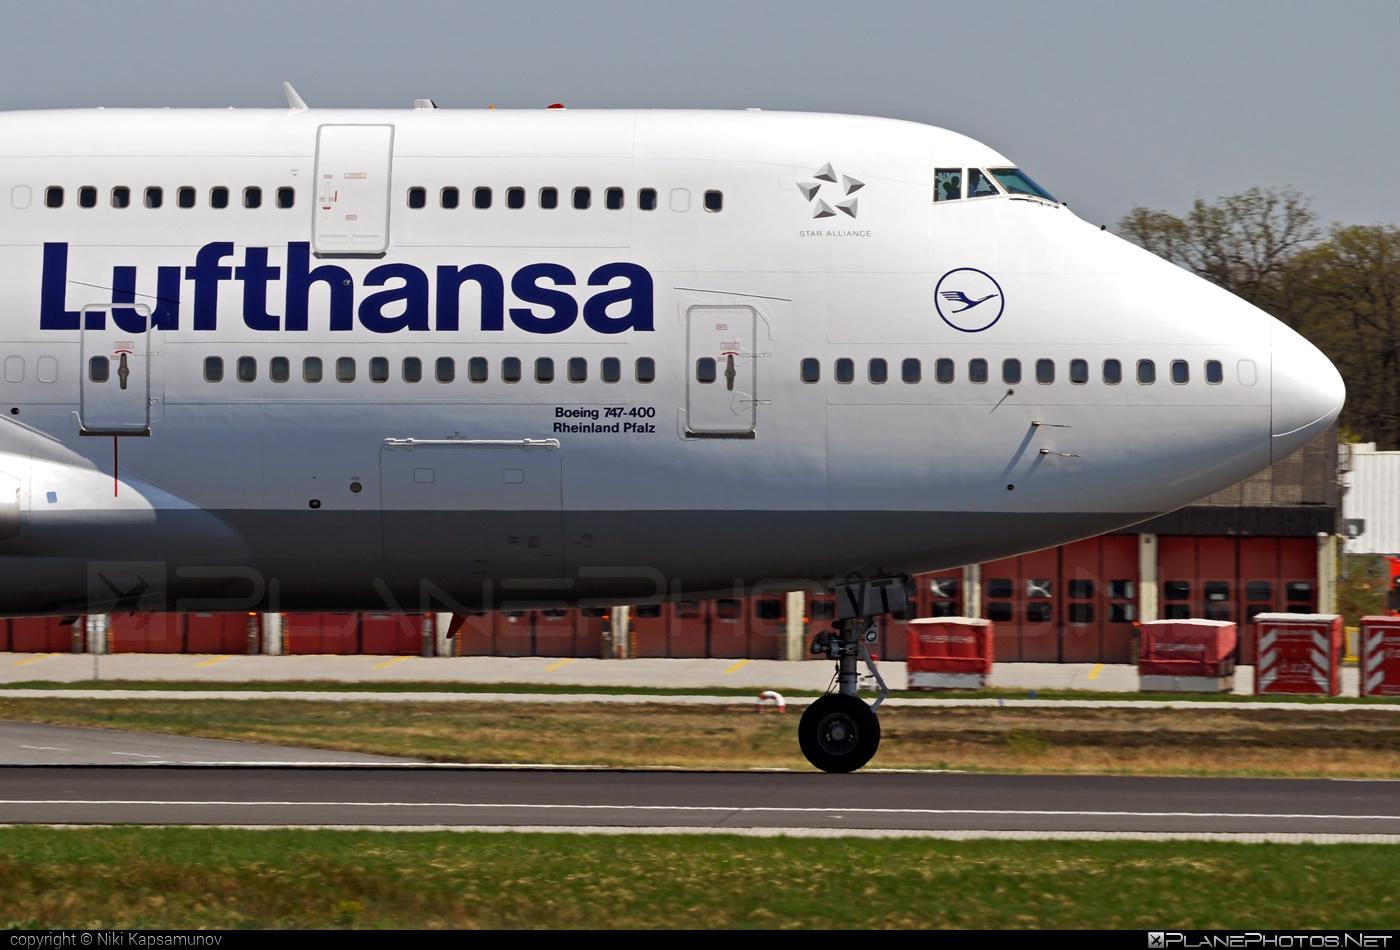 Boeing 747-400 - D-ABVT operated by Lufthansa #b747 #boeing #boeing747 #jumbo #lufthansa